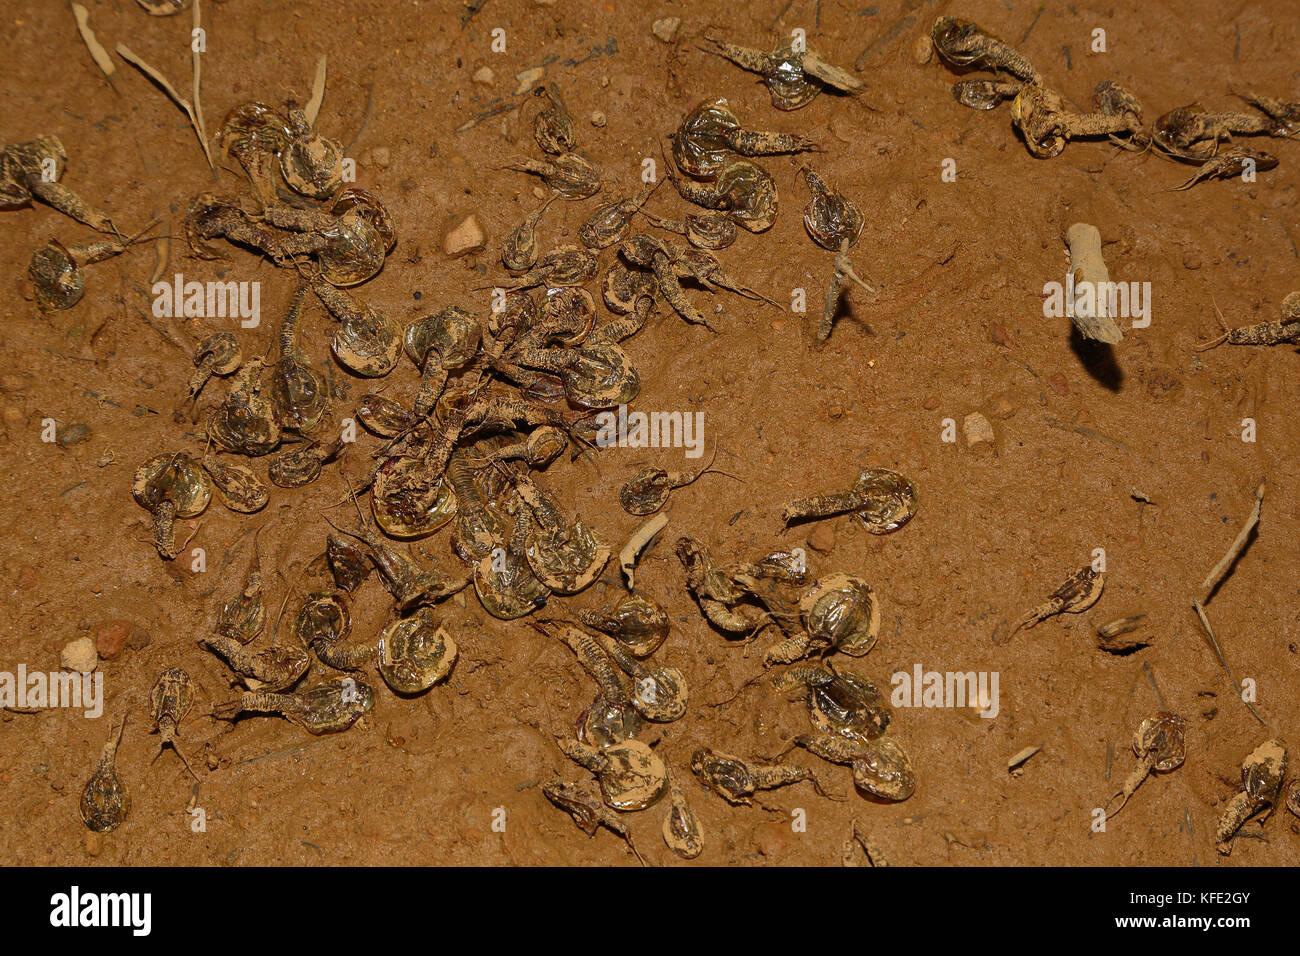 Australian Shield Shrimps Triops Australiensis In Drying Ephemeral Wetland Mount Magnet Pilbara Region Western Australia